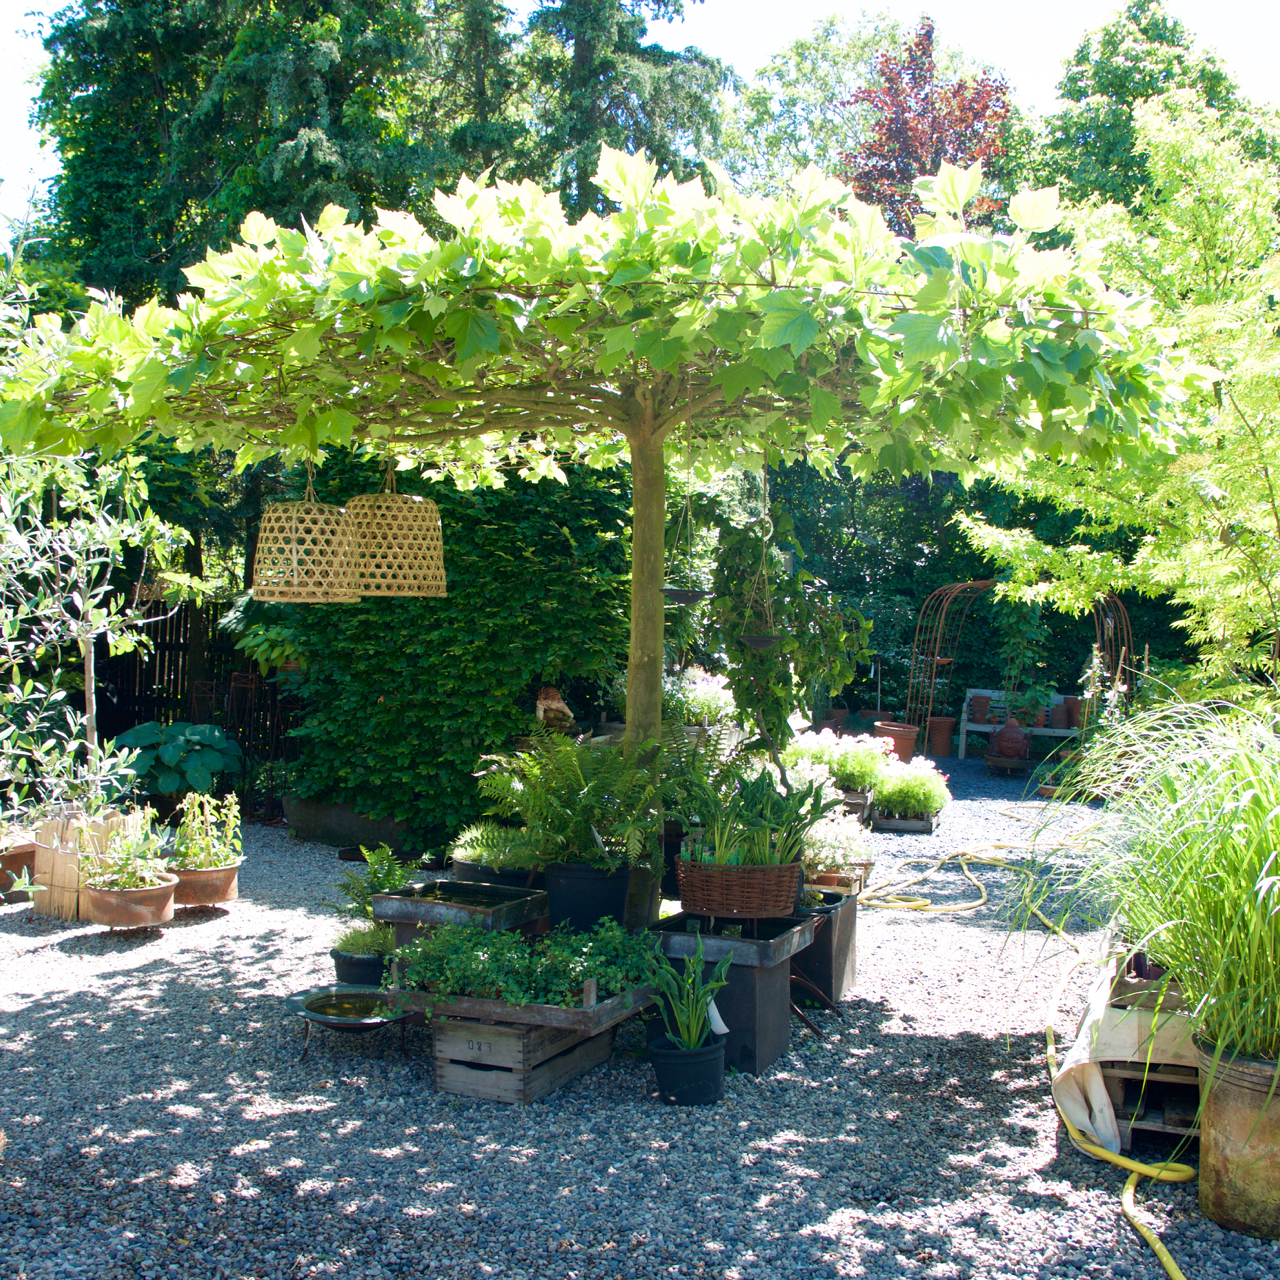 plantskola skåne träd